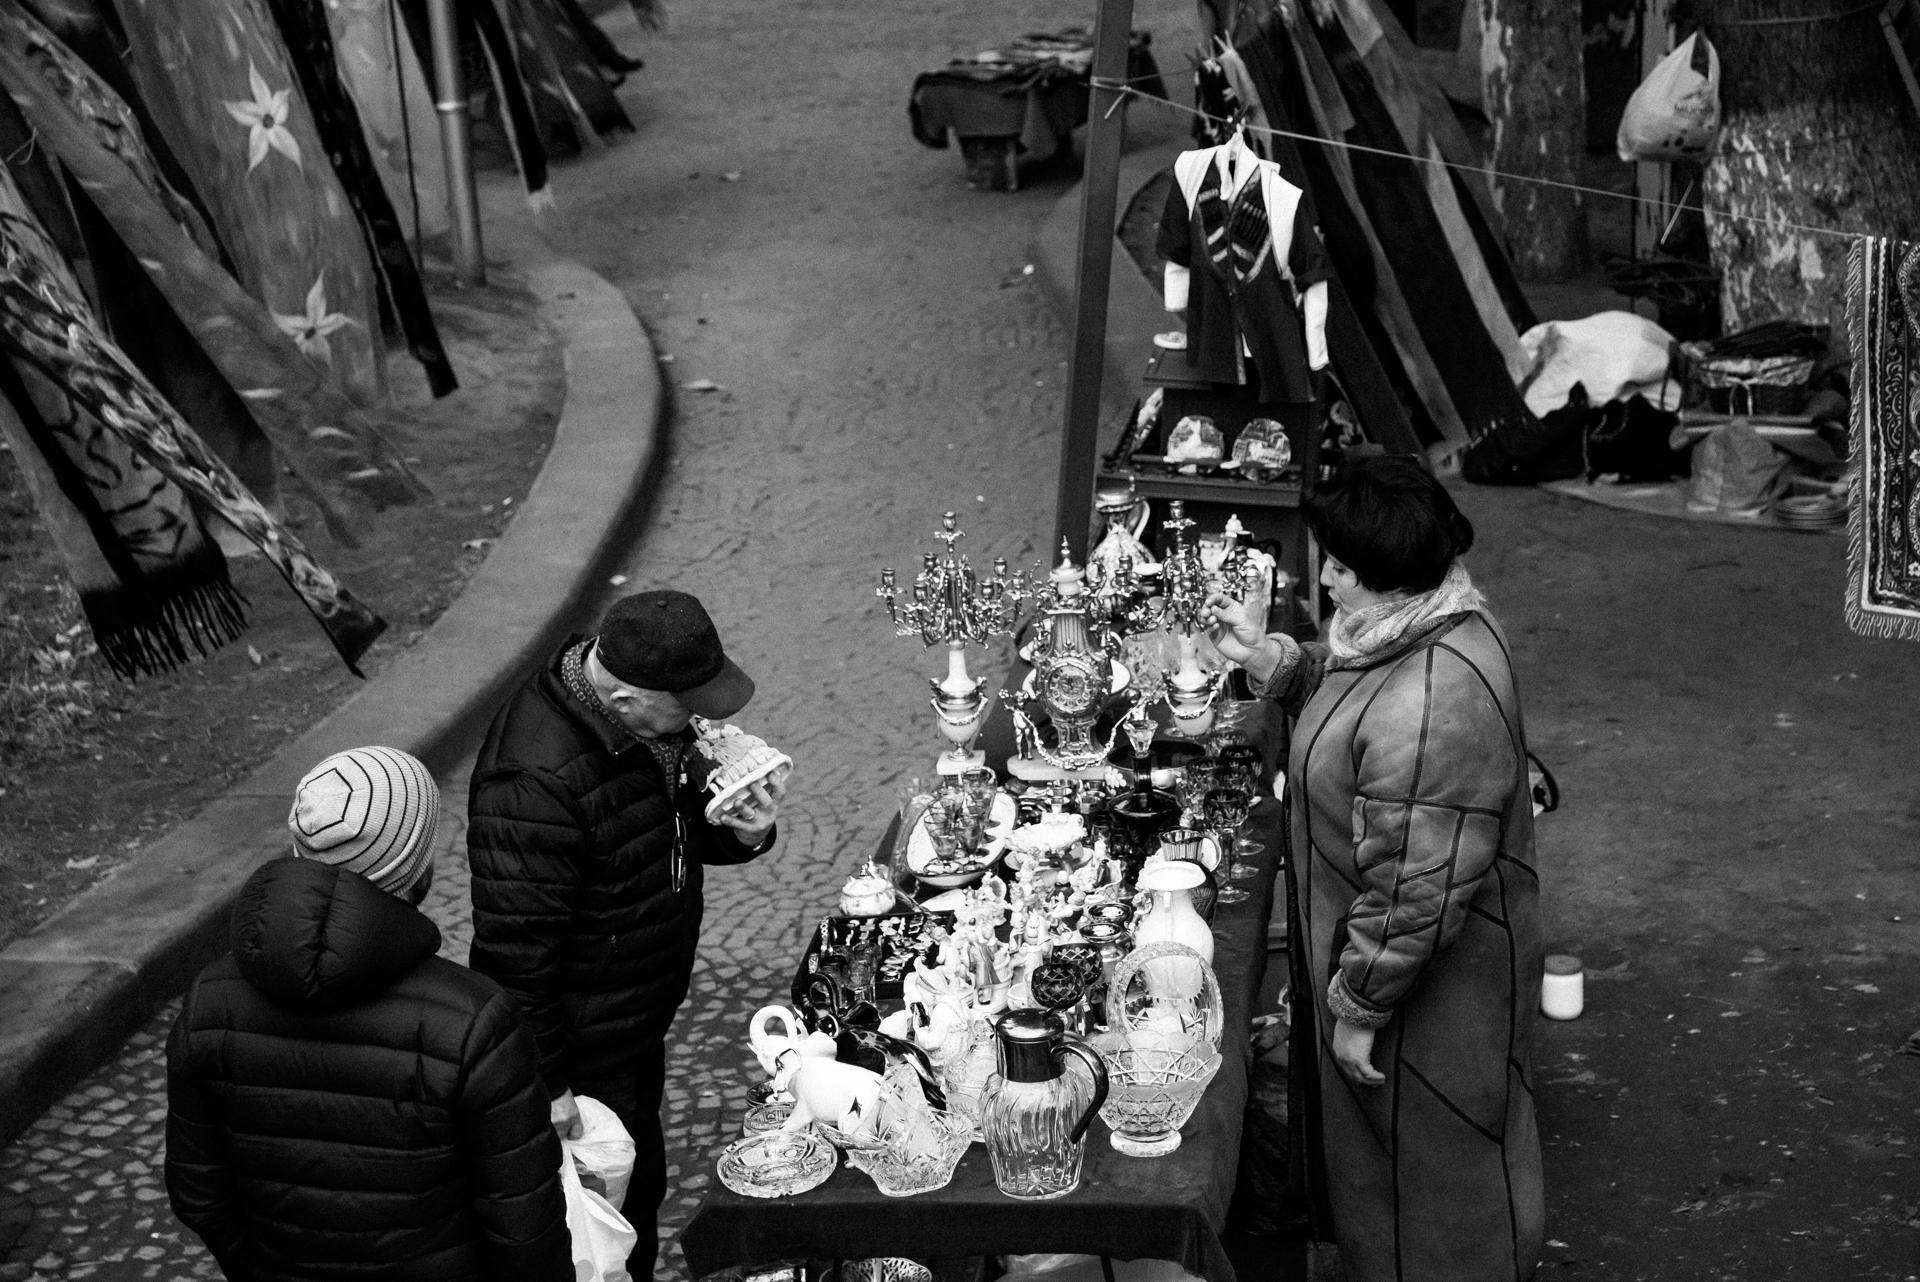 tbilisi-georgia-black-and-white-photography (4).jpg